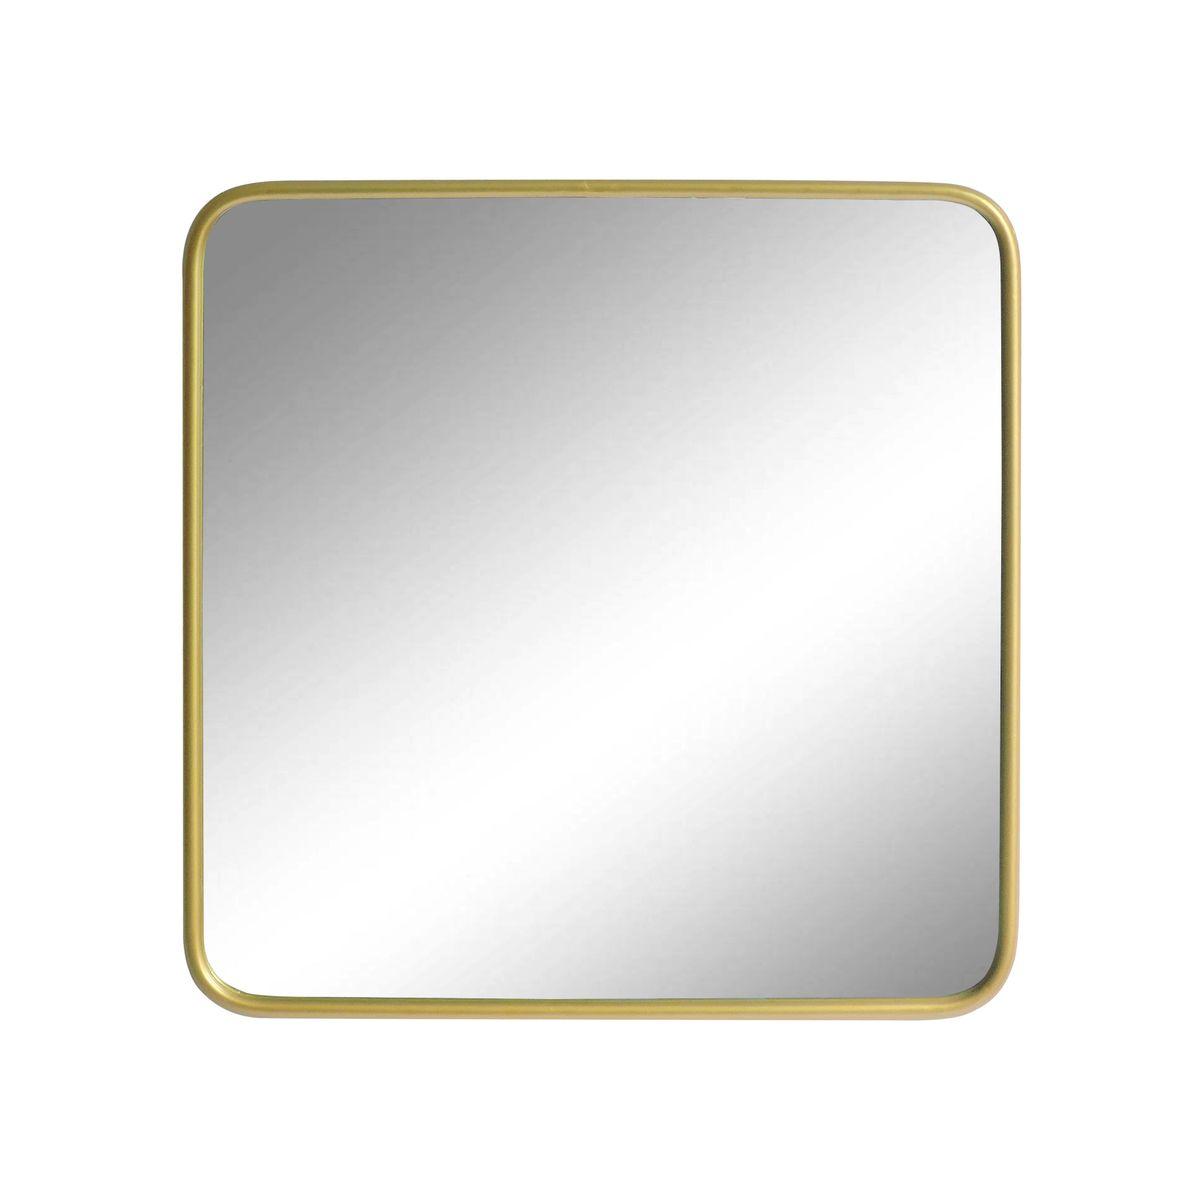 Miroir carré angles arrondis laiton or 65x65